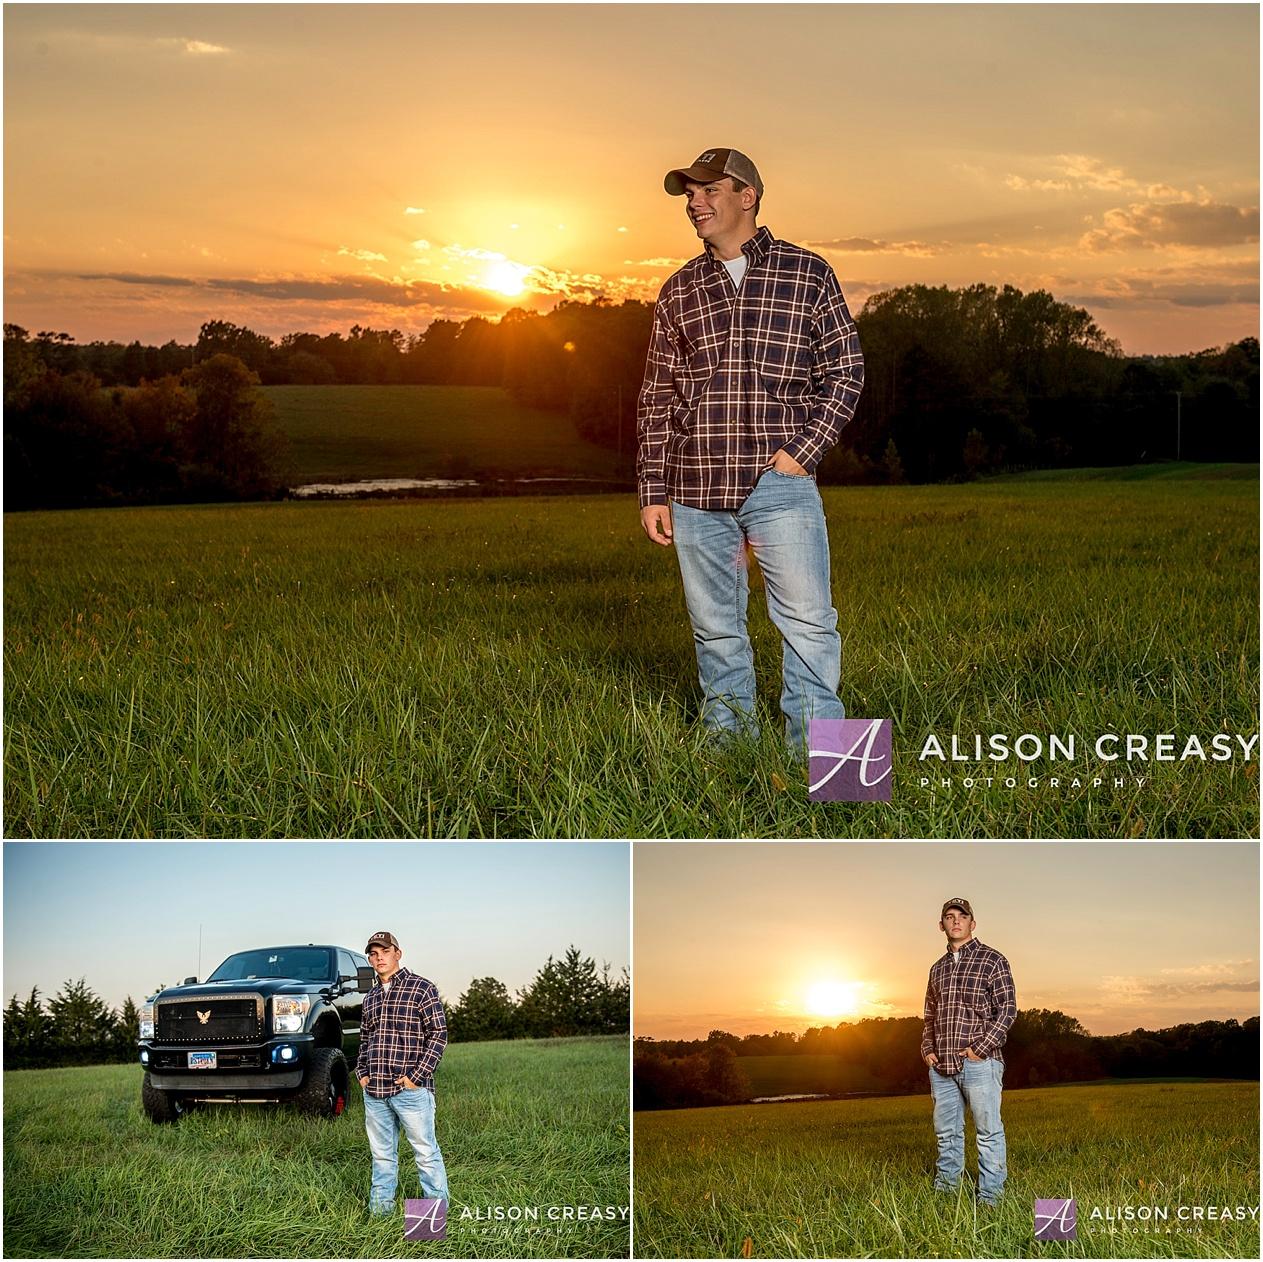 Alison Creasy Photography Daegan_0009.jpg